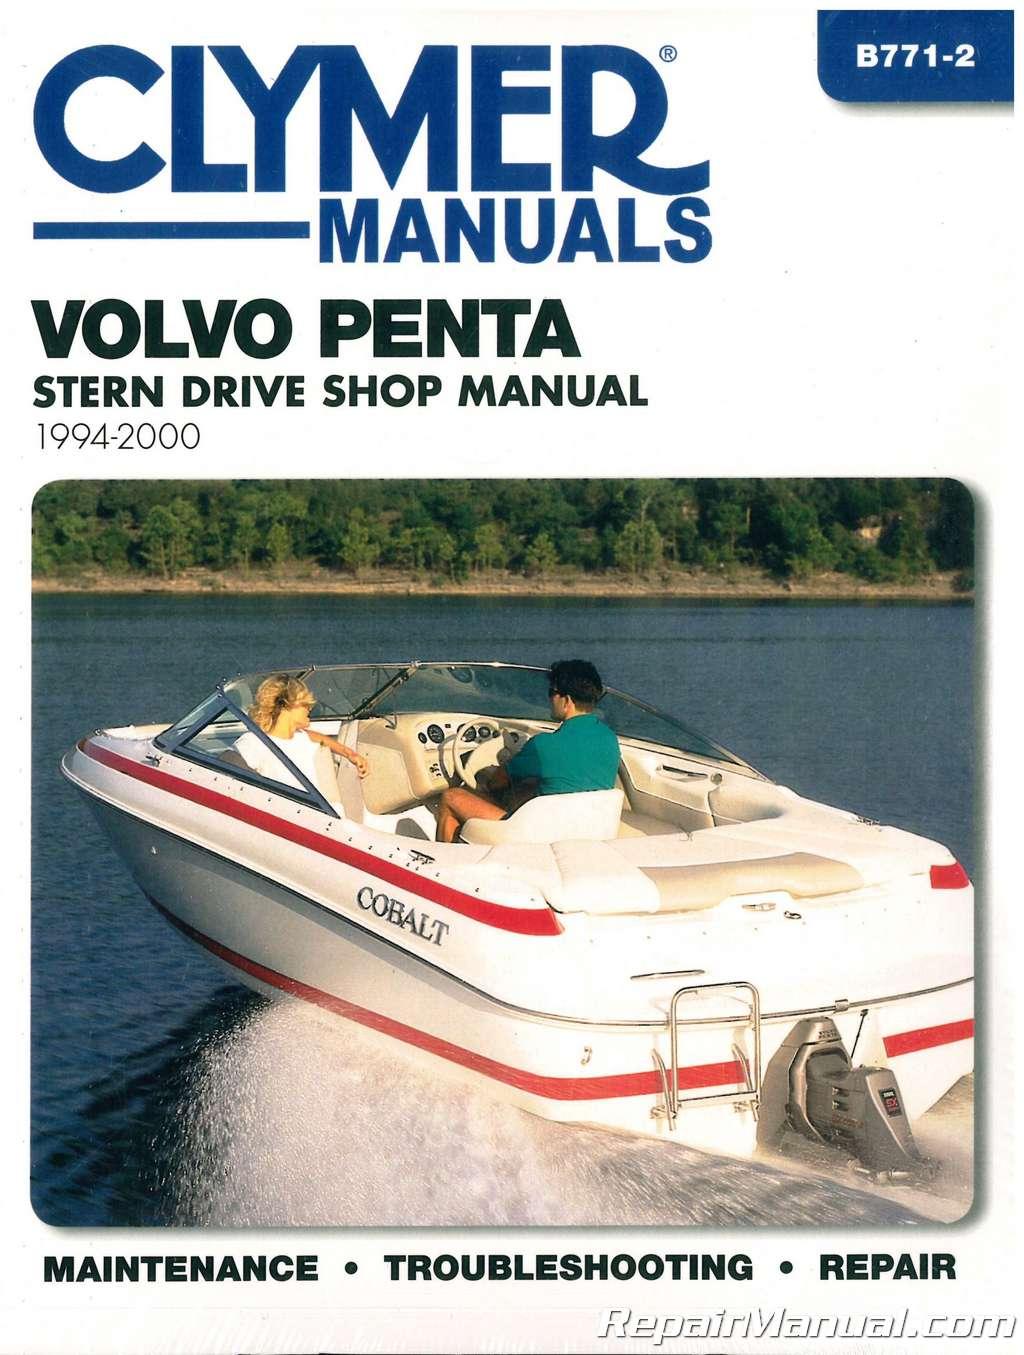 clymer 1994 2000 volvo penta stern drive boat engine repair manual rh repairmanual com volvo penta stern drive shop manual volvo penta stern drive shop manual